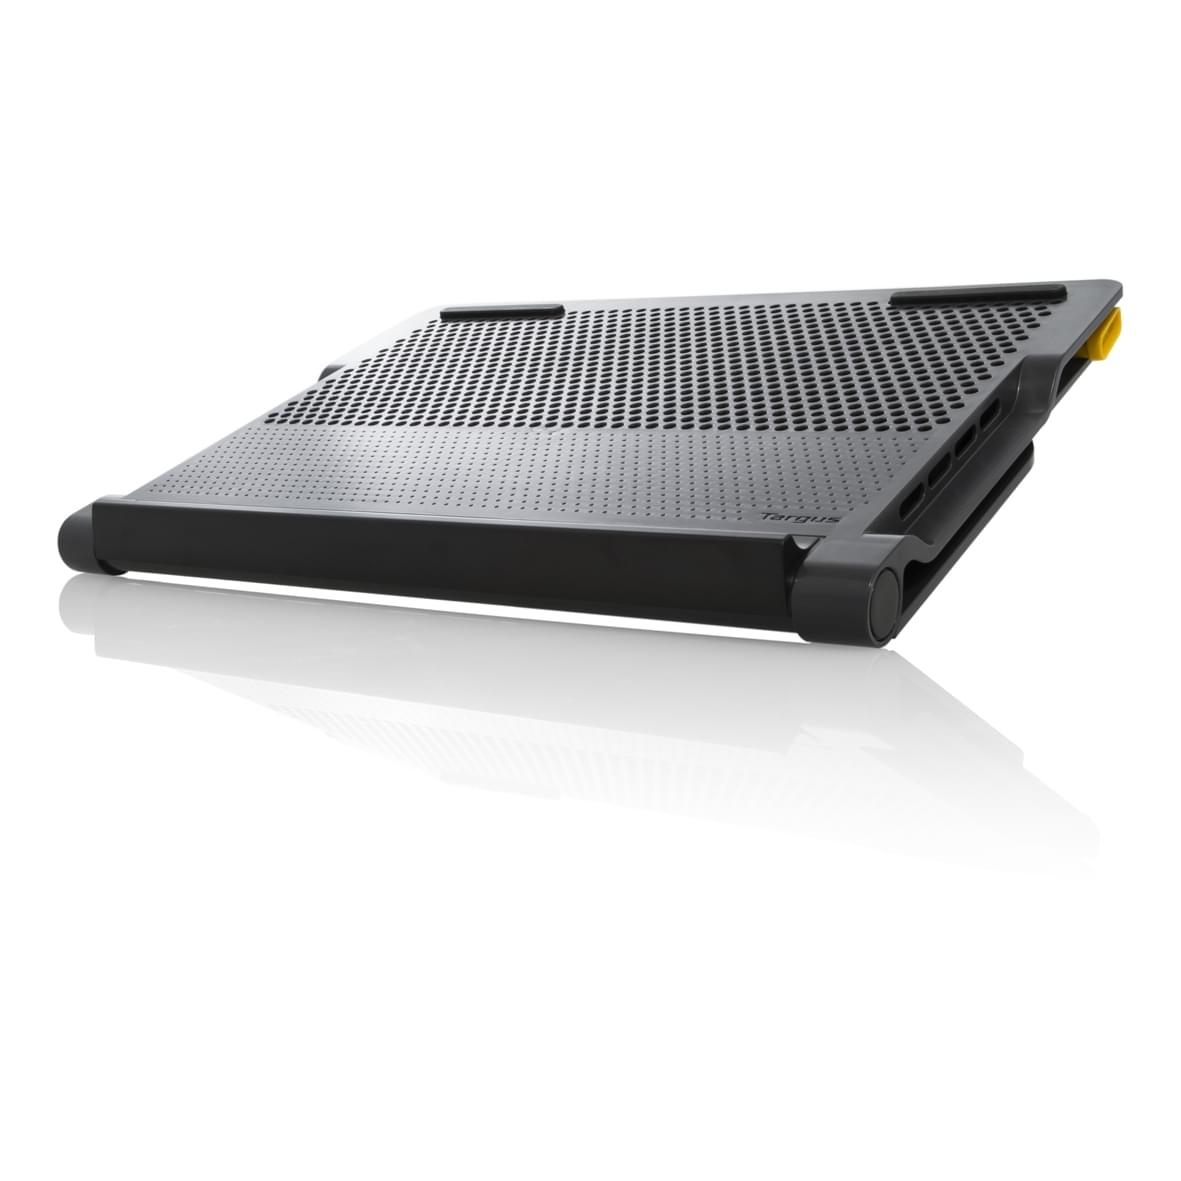 "Targus Refroidisseur Notebook+Hub AWE81EU max 17"" (AWE81EU) - Achat / Vente Ventilateur CPU sur Cybertek.fr - 0"